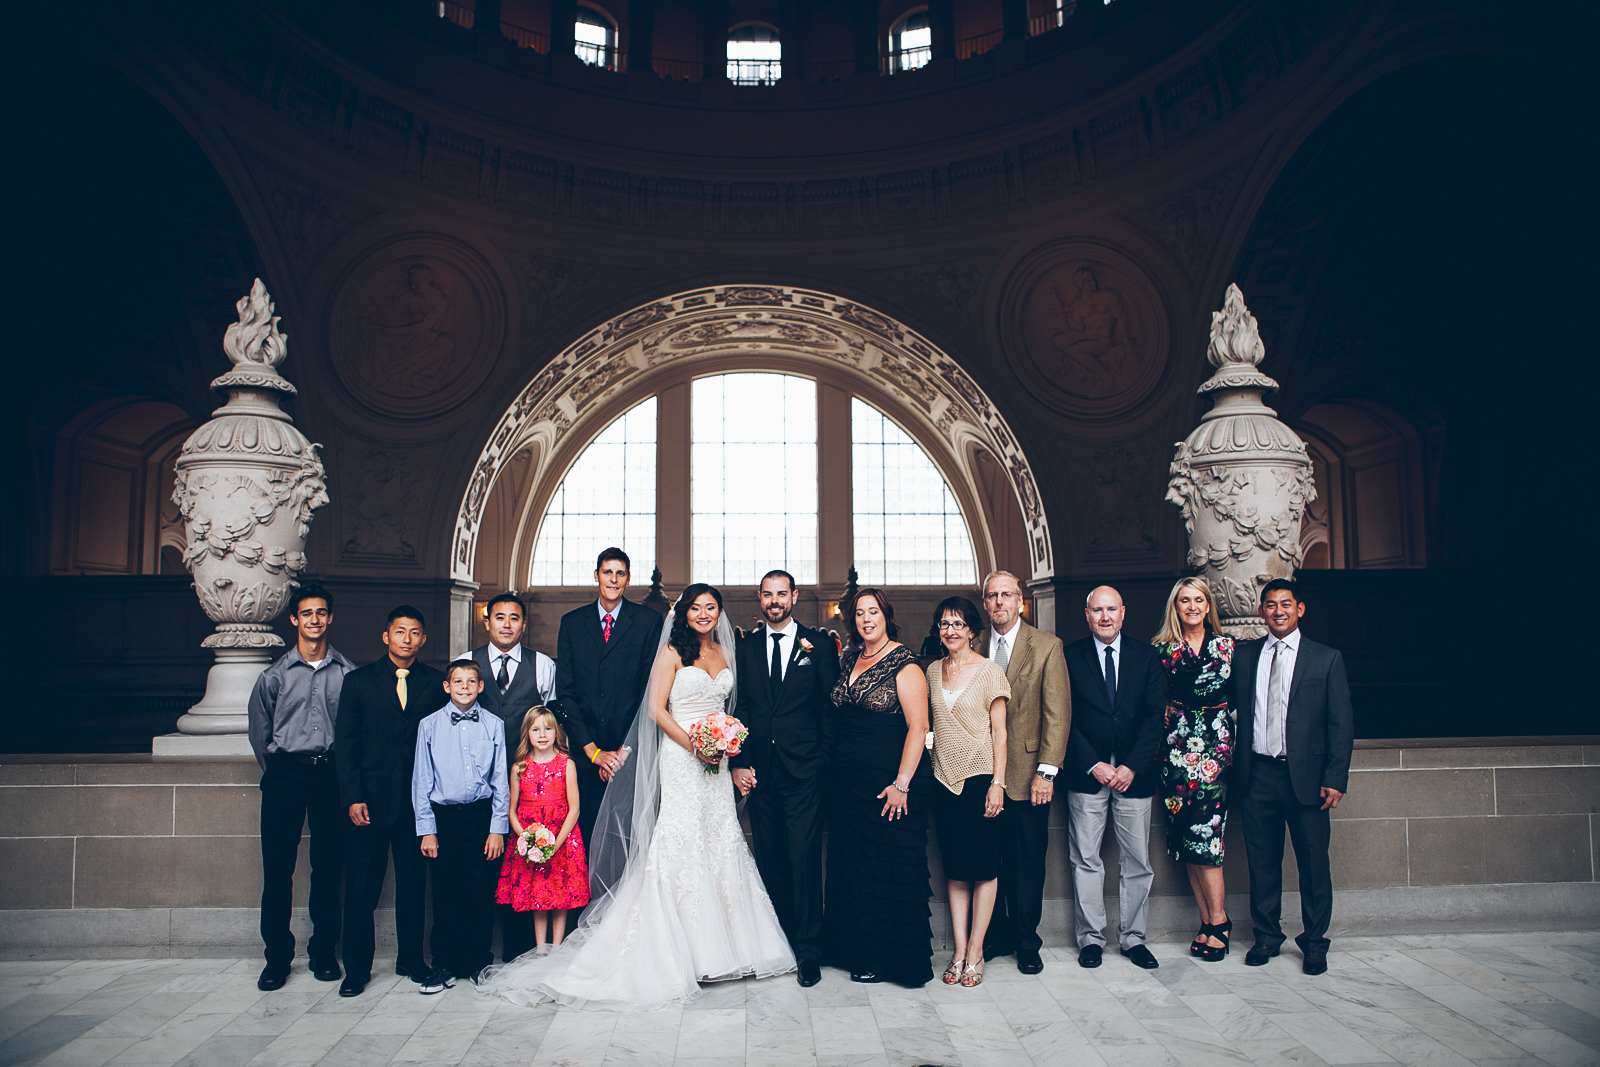 San_francisco_city_hall_wedding_photography_meegan_travis_ebony_siovhan_bokeh_photography_33.jpg